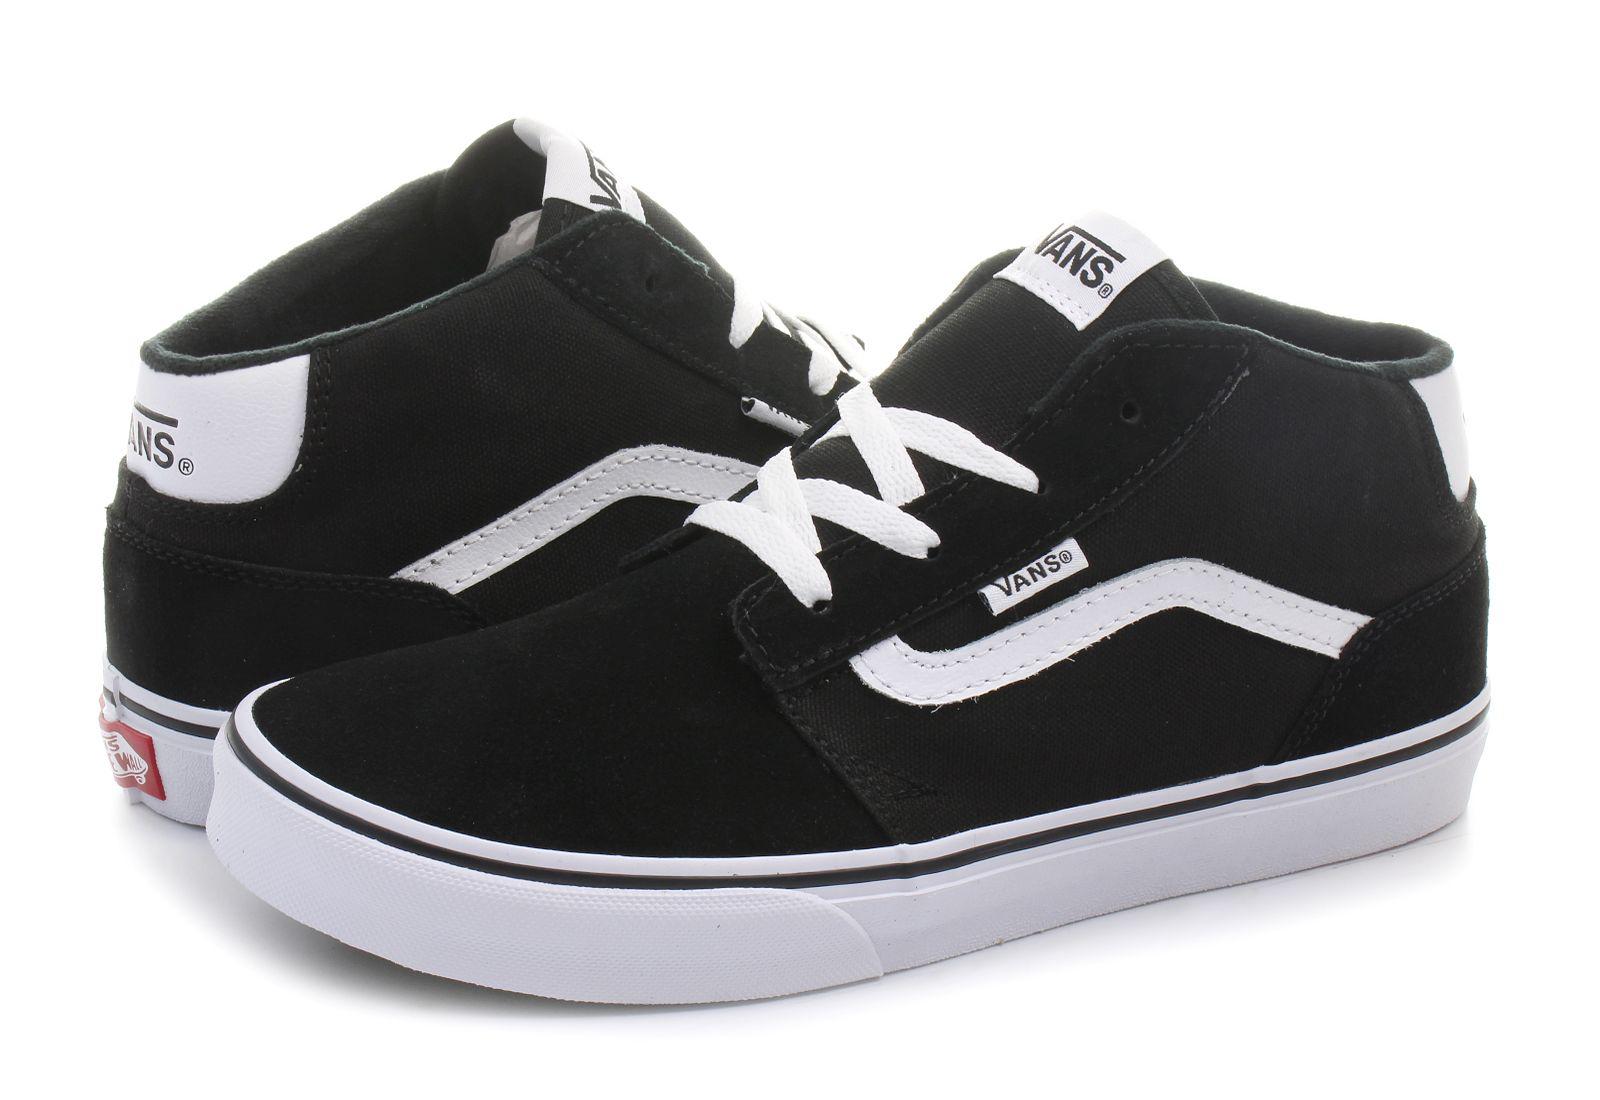 Vans Tenisi - Chapman Mid - VA38J4IJU - Office Shoes Romania 17512881c4